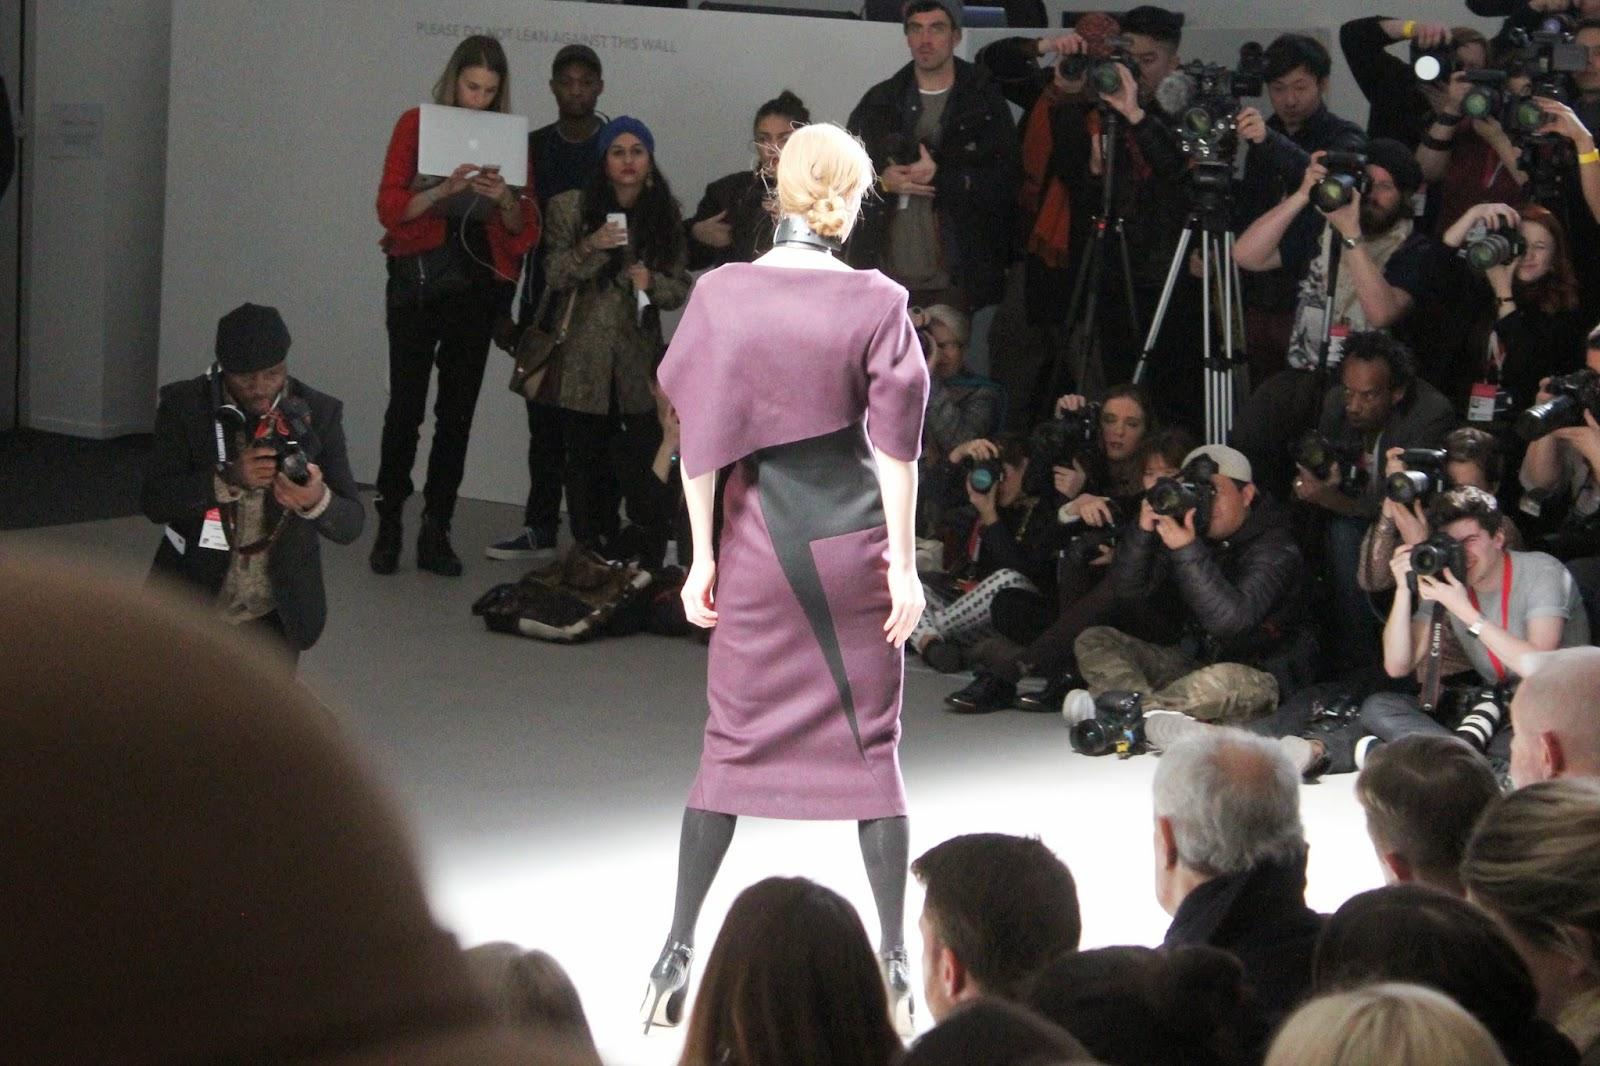 london-fashion-week-lfw-jean-pierre-braganza-catwalk-models-somerset-house